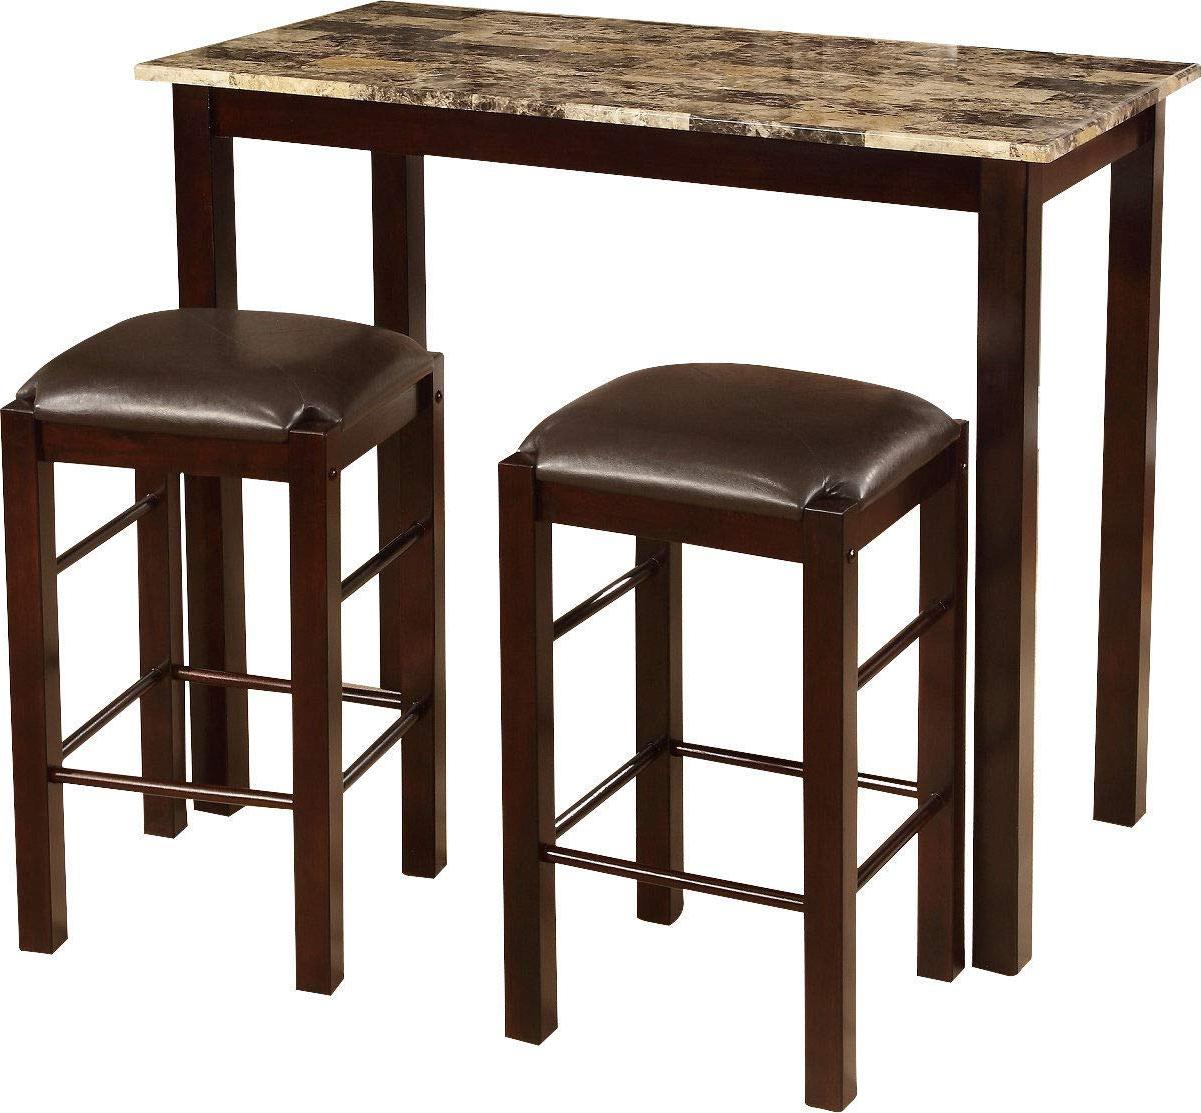 Preferred Penelope 3 Piece Counter Height Wood Dining Sets Inside Amazon – Winston Porter Penelope 3 Piece Counter Height Wood (View 3 of 25)